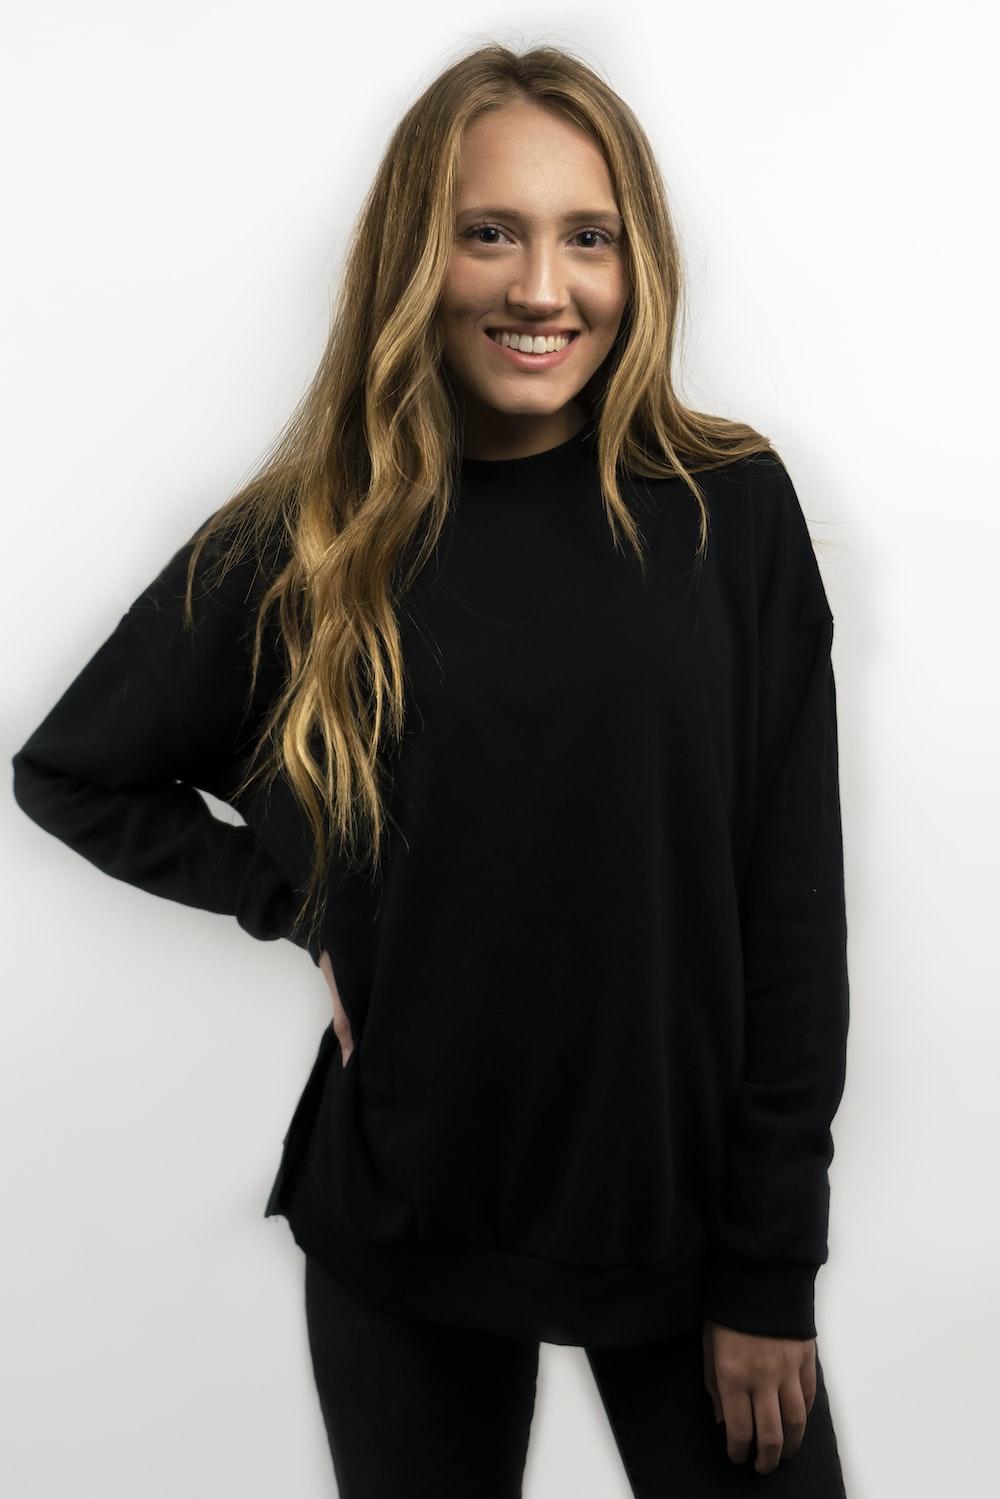 woman wearing black sweater